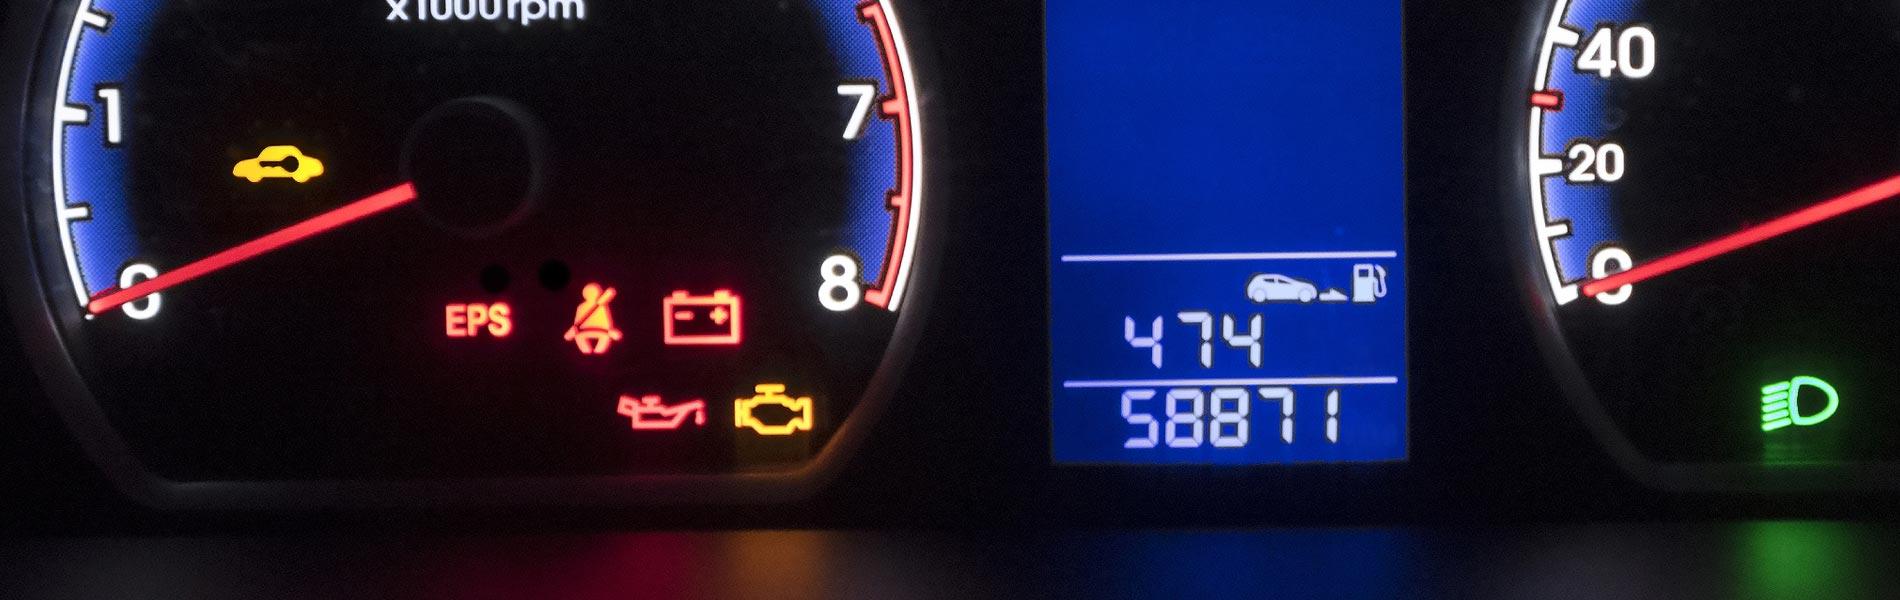 Mazda 3 Owners Manual: Indicator Lights